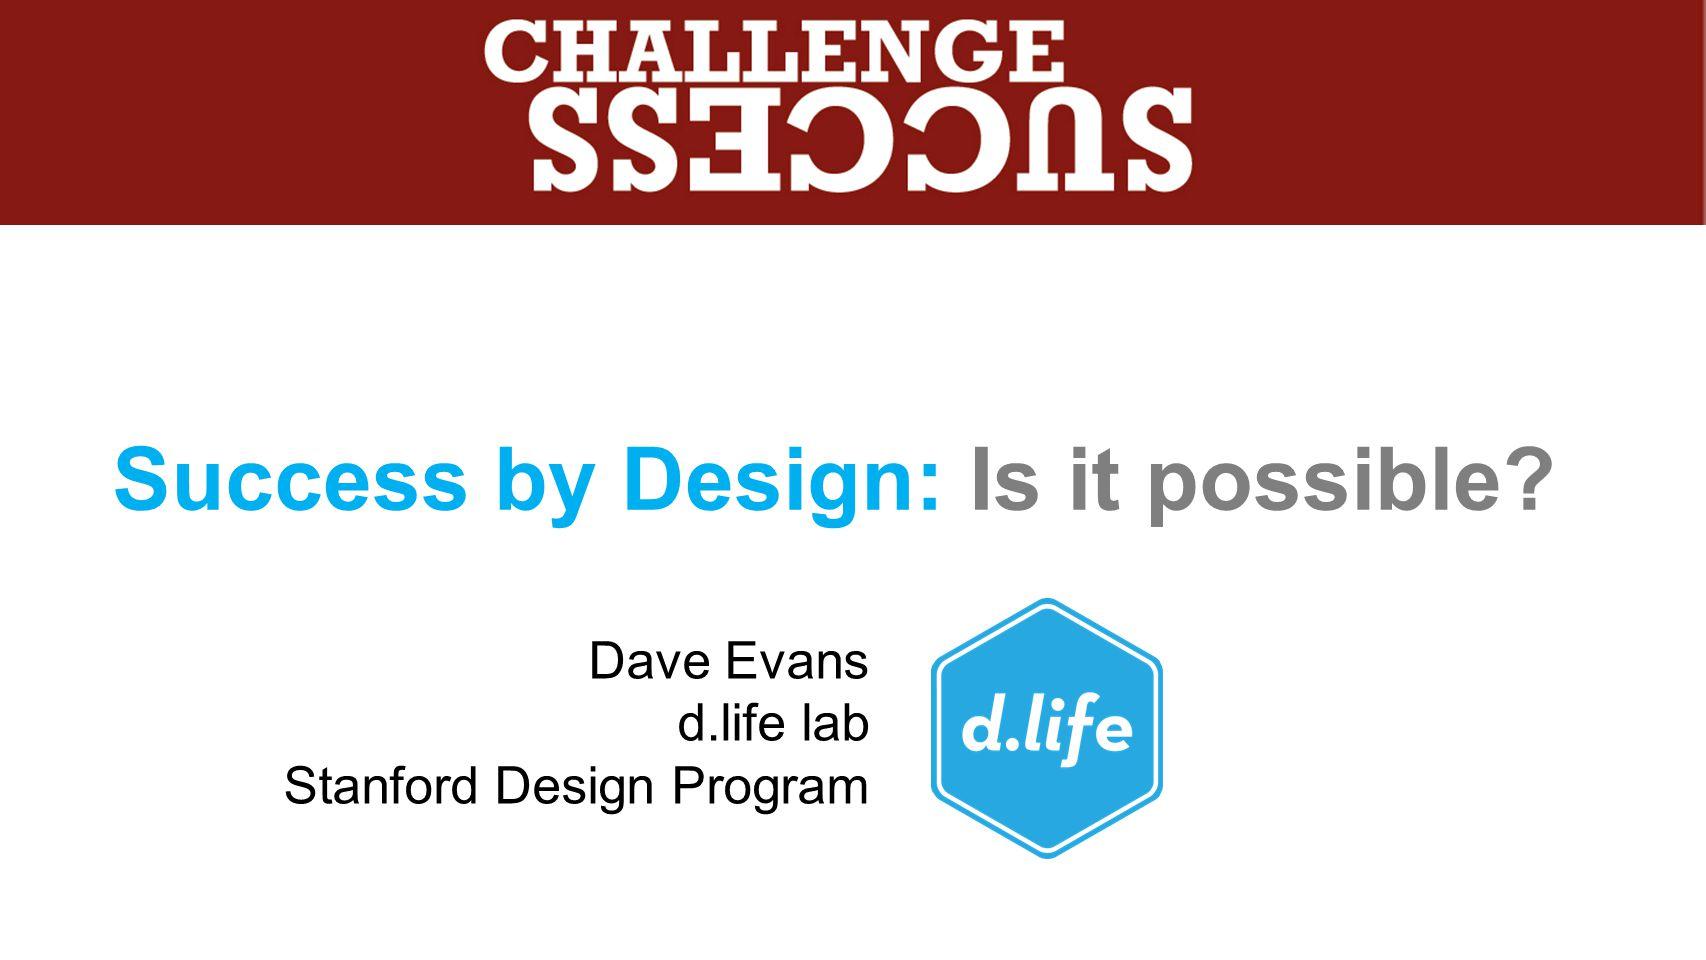 Success by Design: Is it possible? Dave Evans d.life lab Stanford Design Program